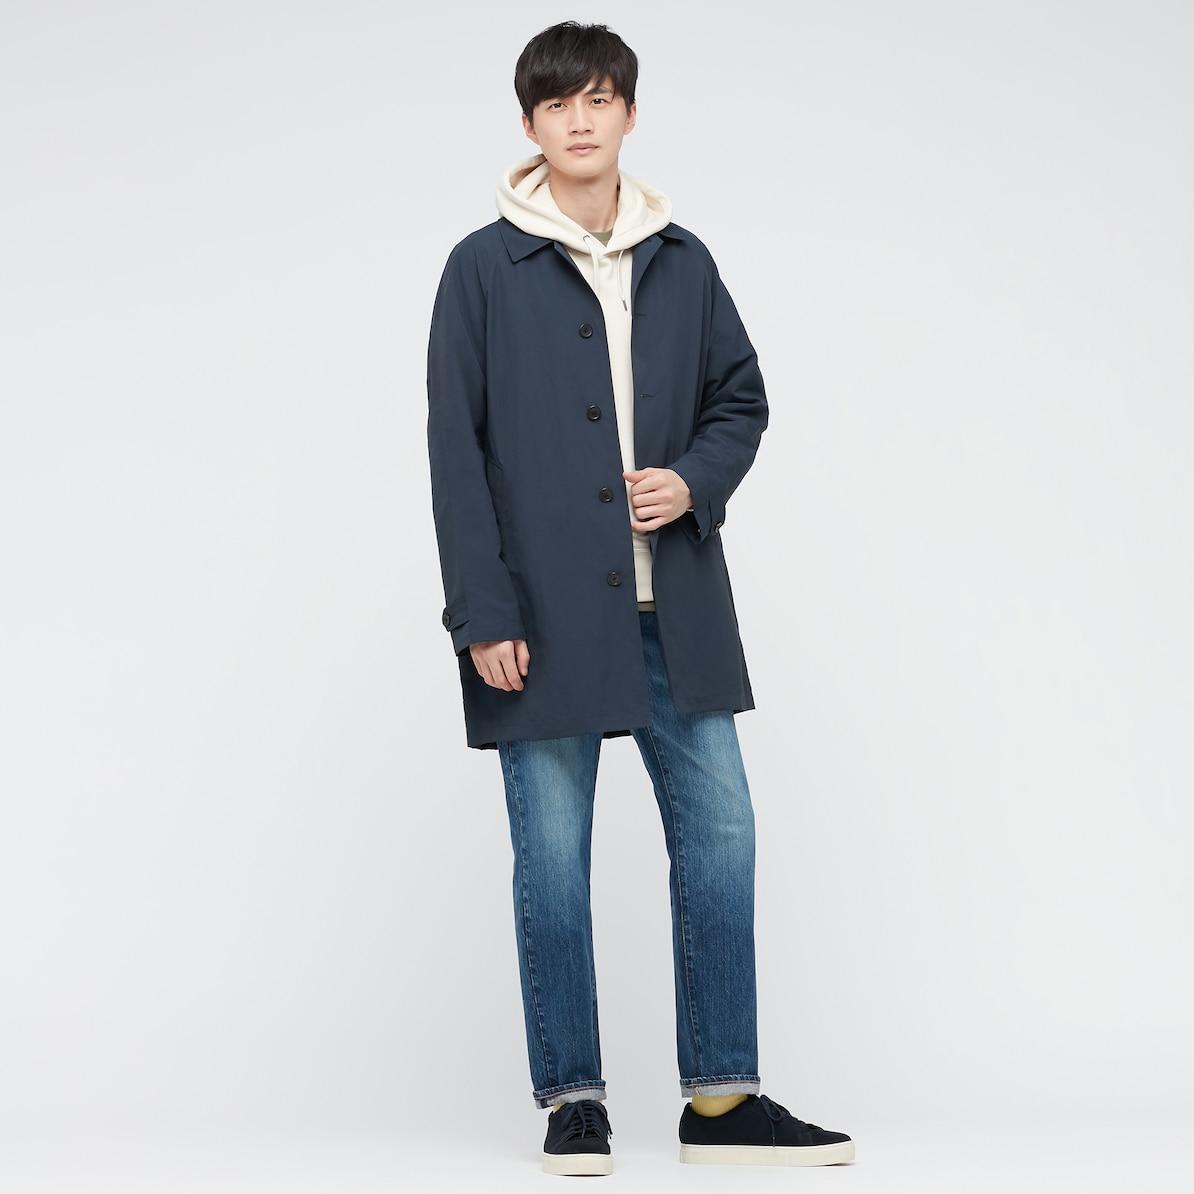 f:id:yamada0221:20210129125216j:plain